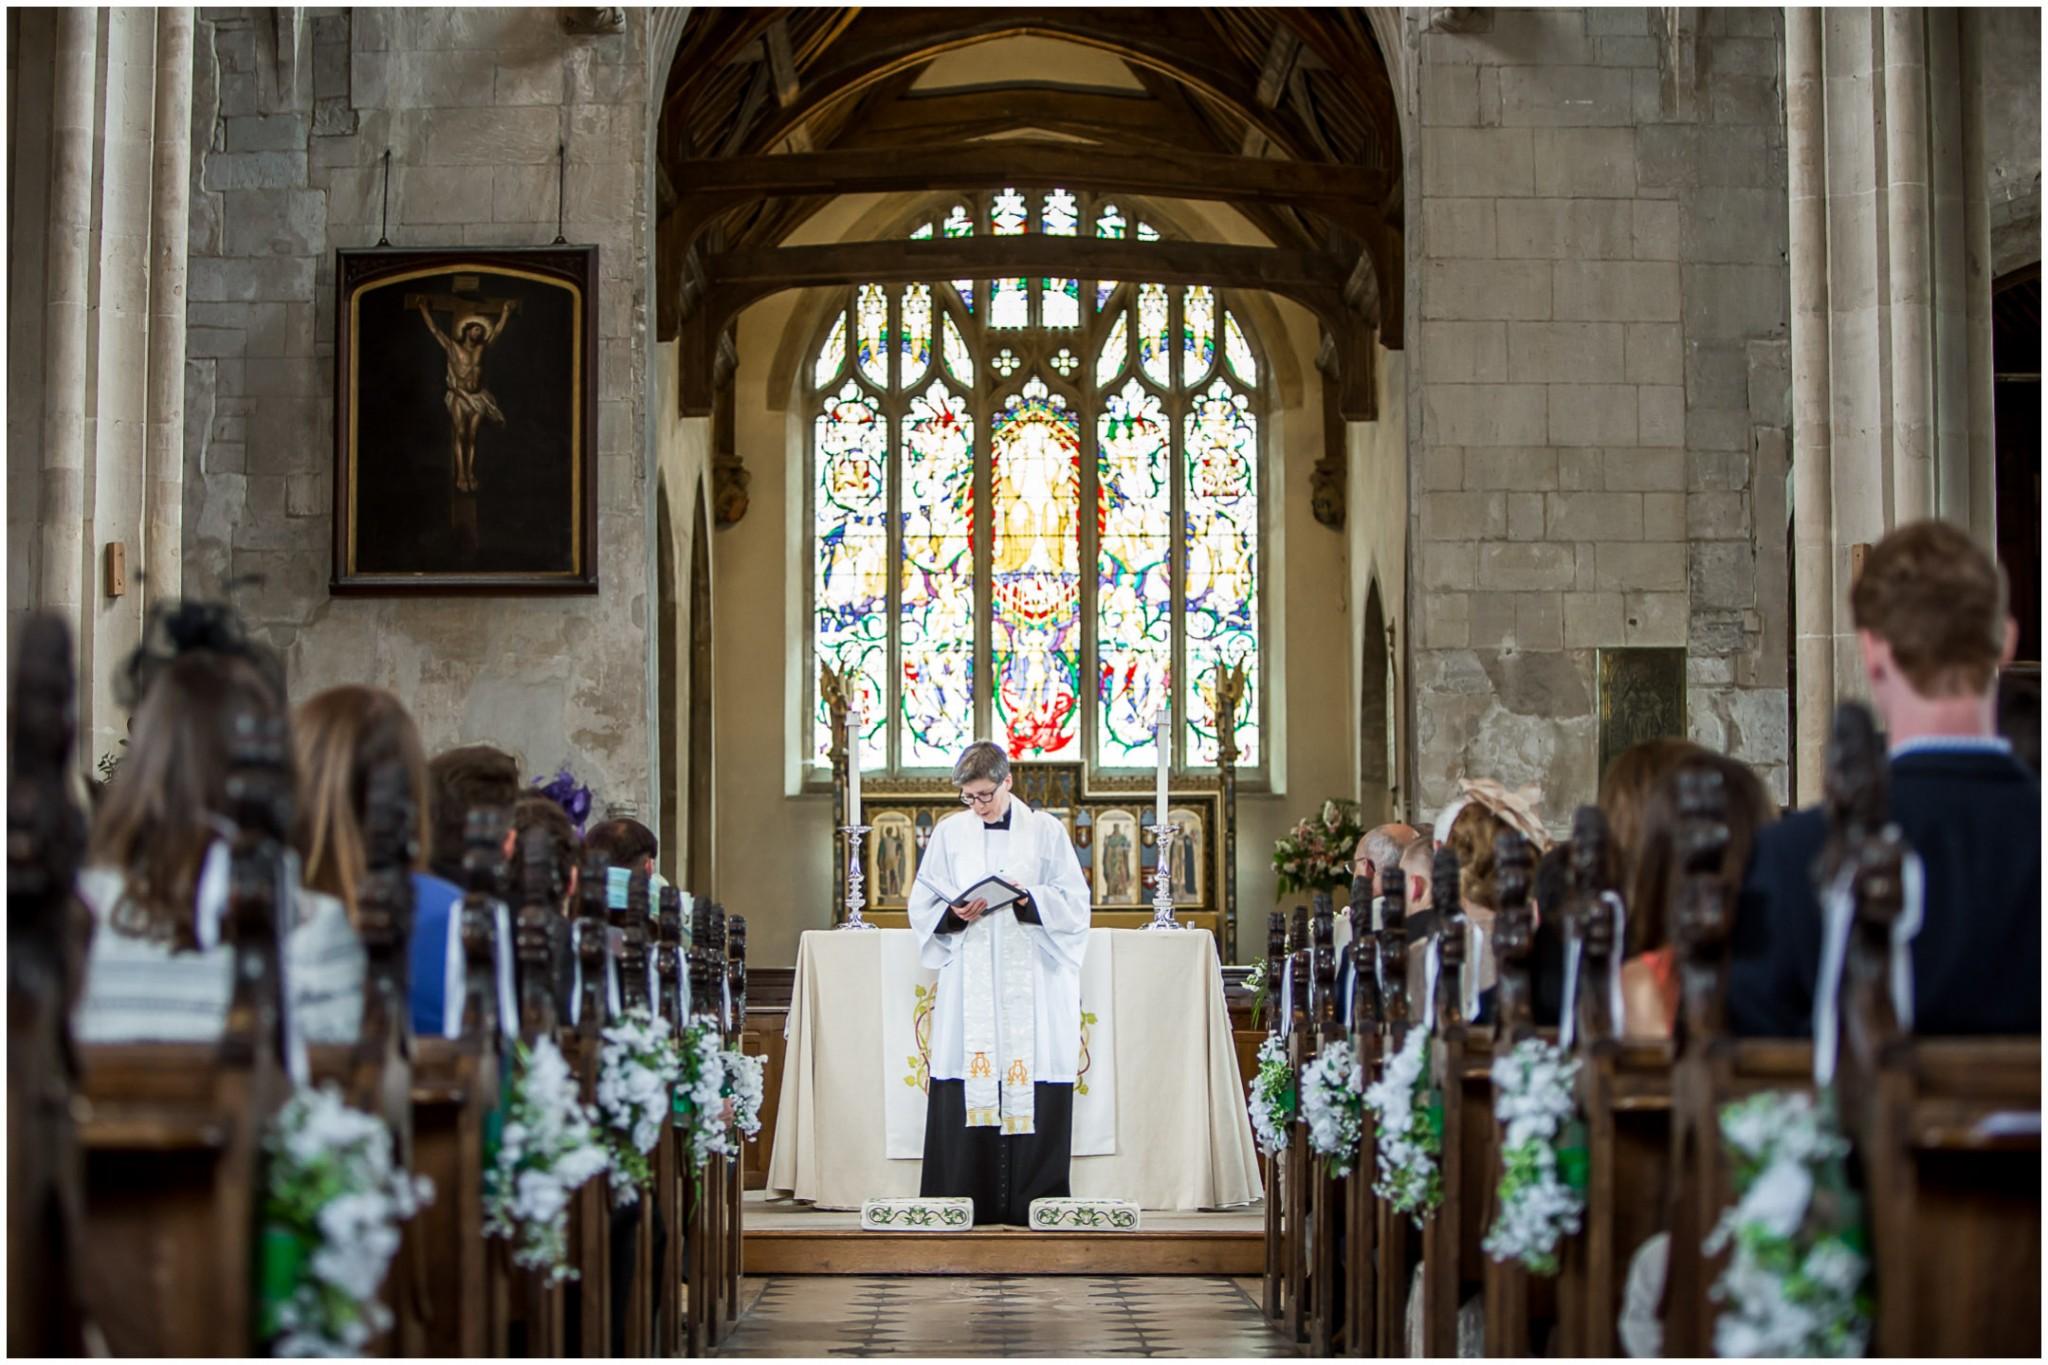 Highfield Park Wedding Photography Vicar's sermon